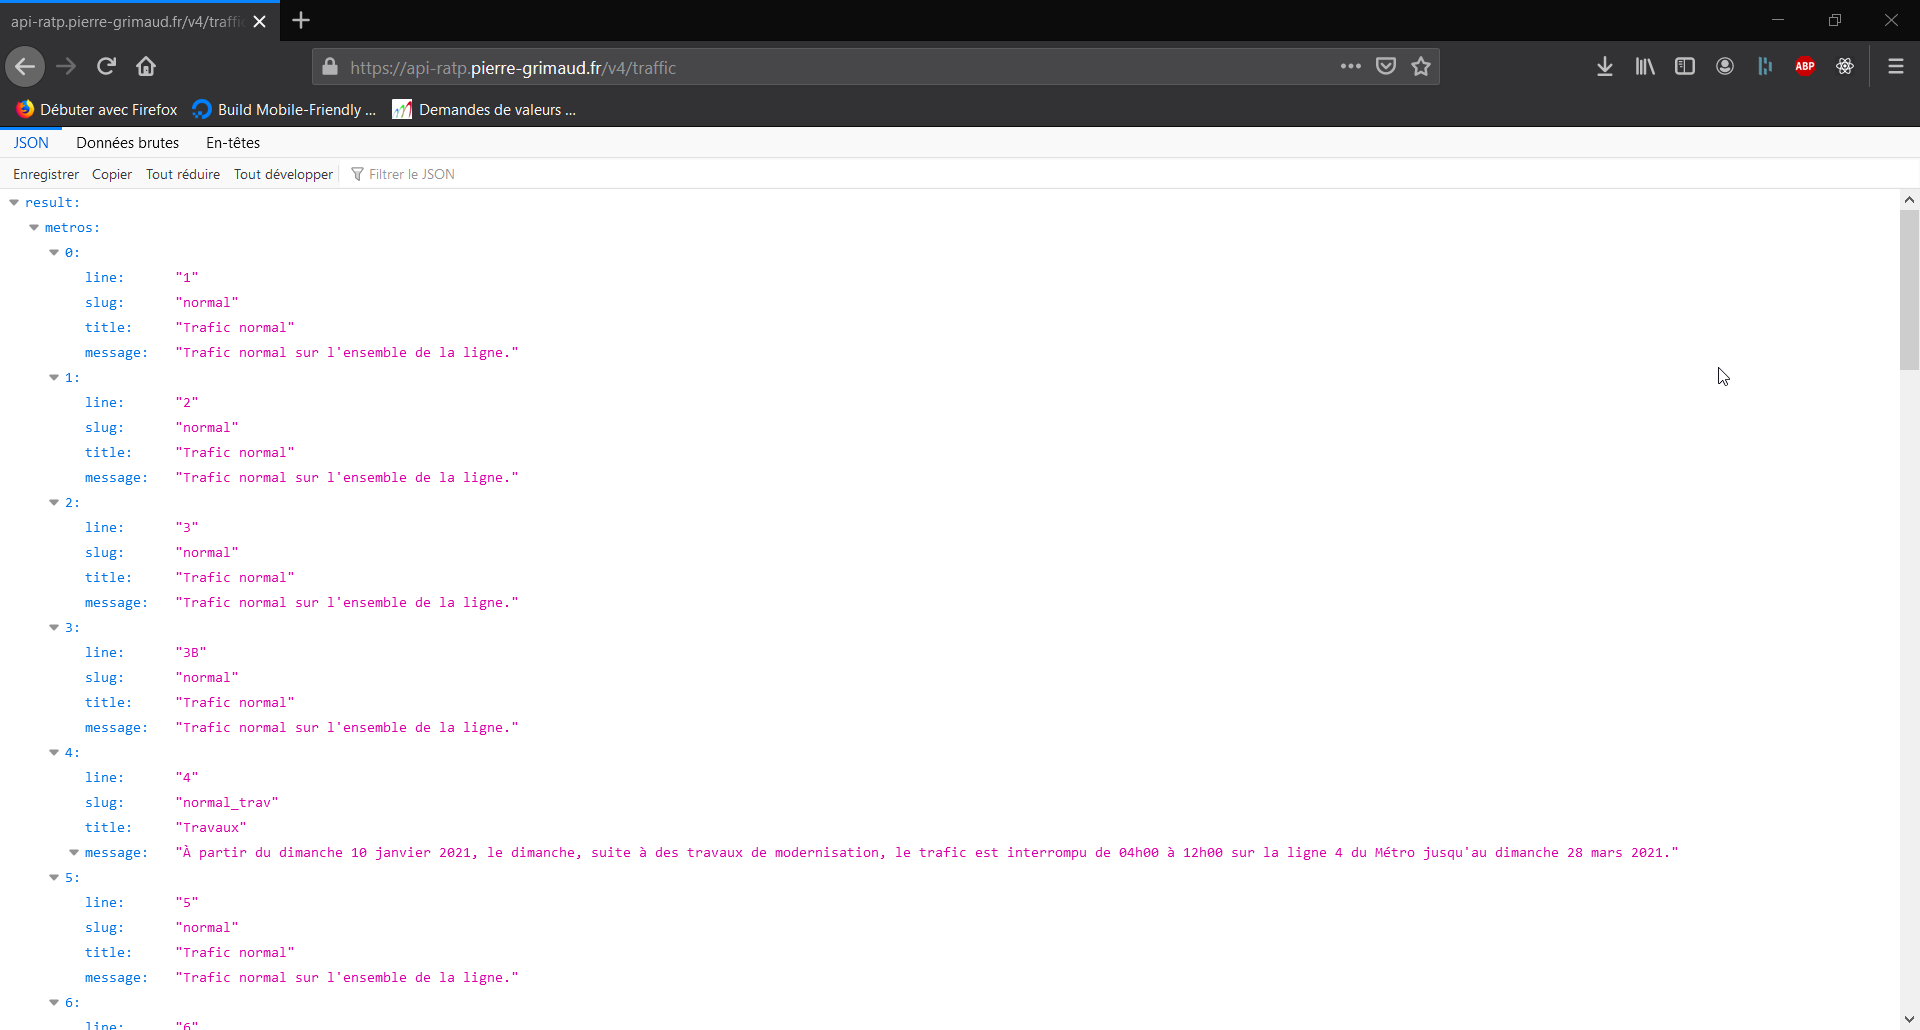 Screenshot 2021-03-01 11-35-21